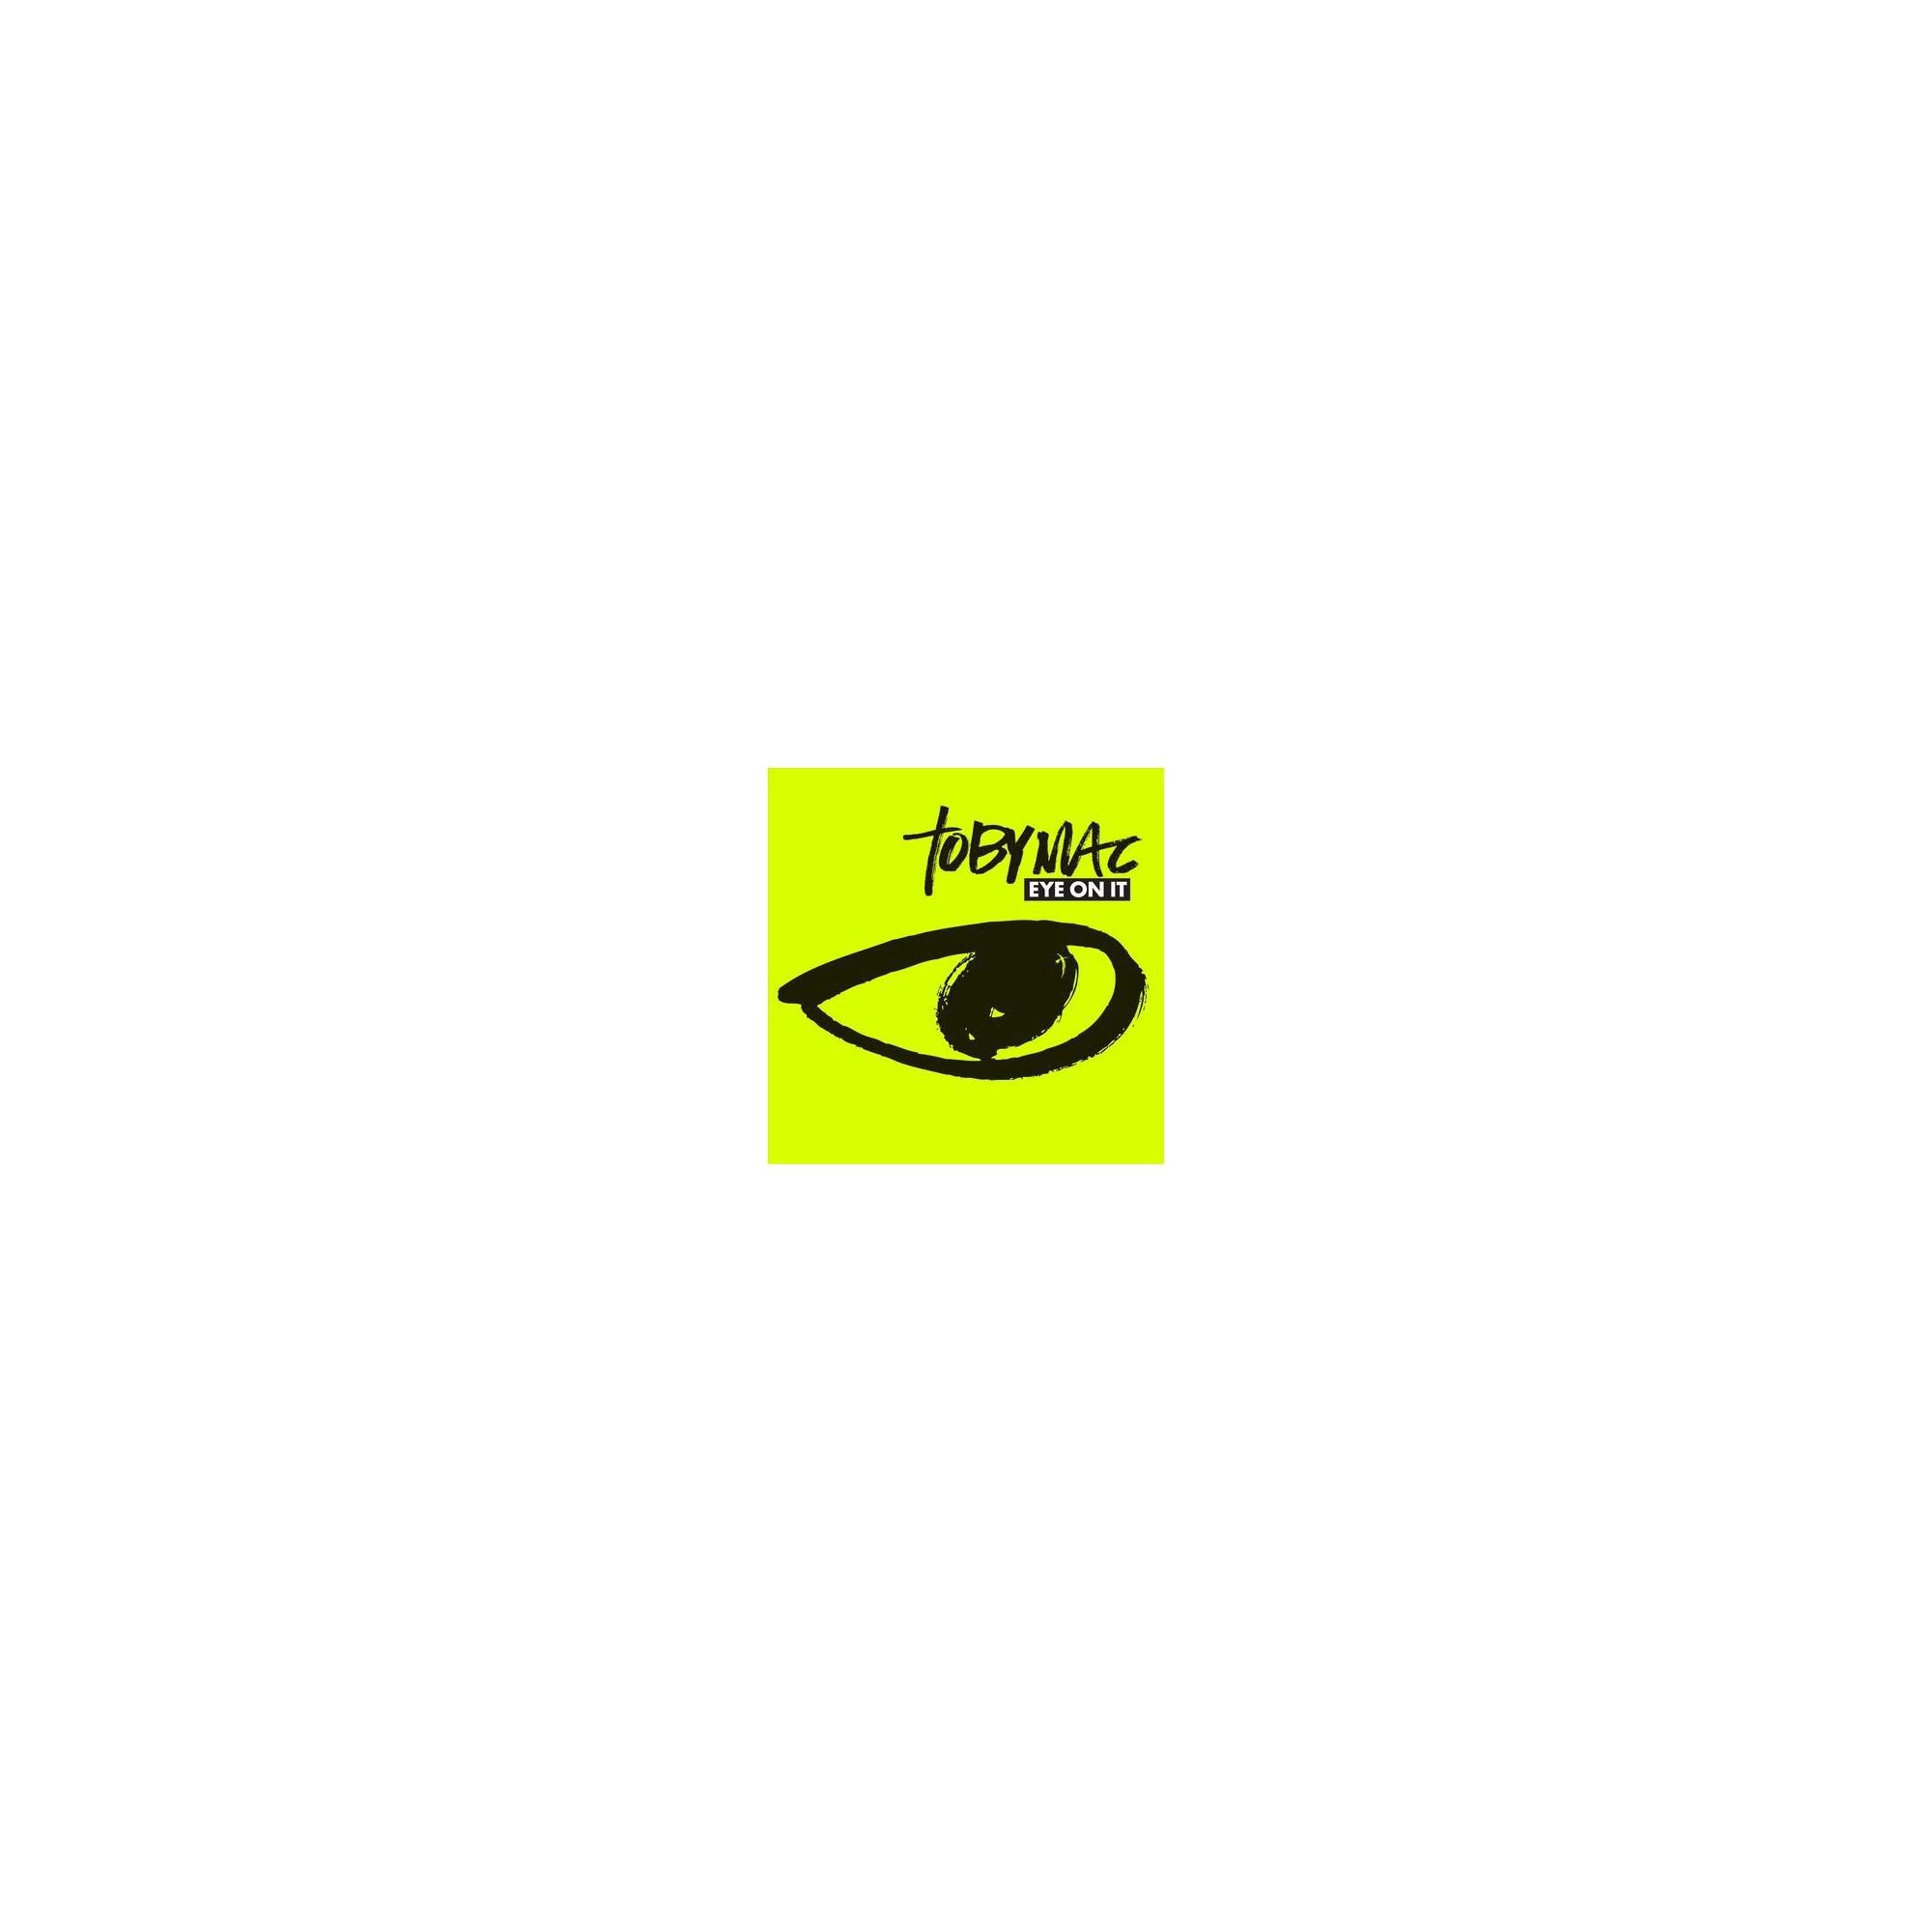 Reihe nach hause exterieur design tobymac  eye on it cd pop music  products  pinterest